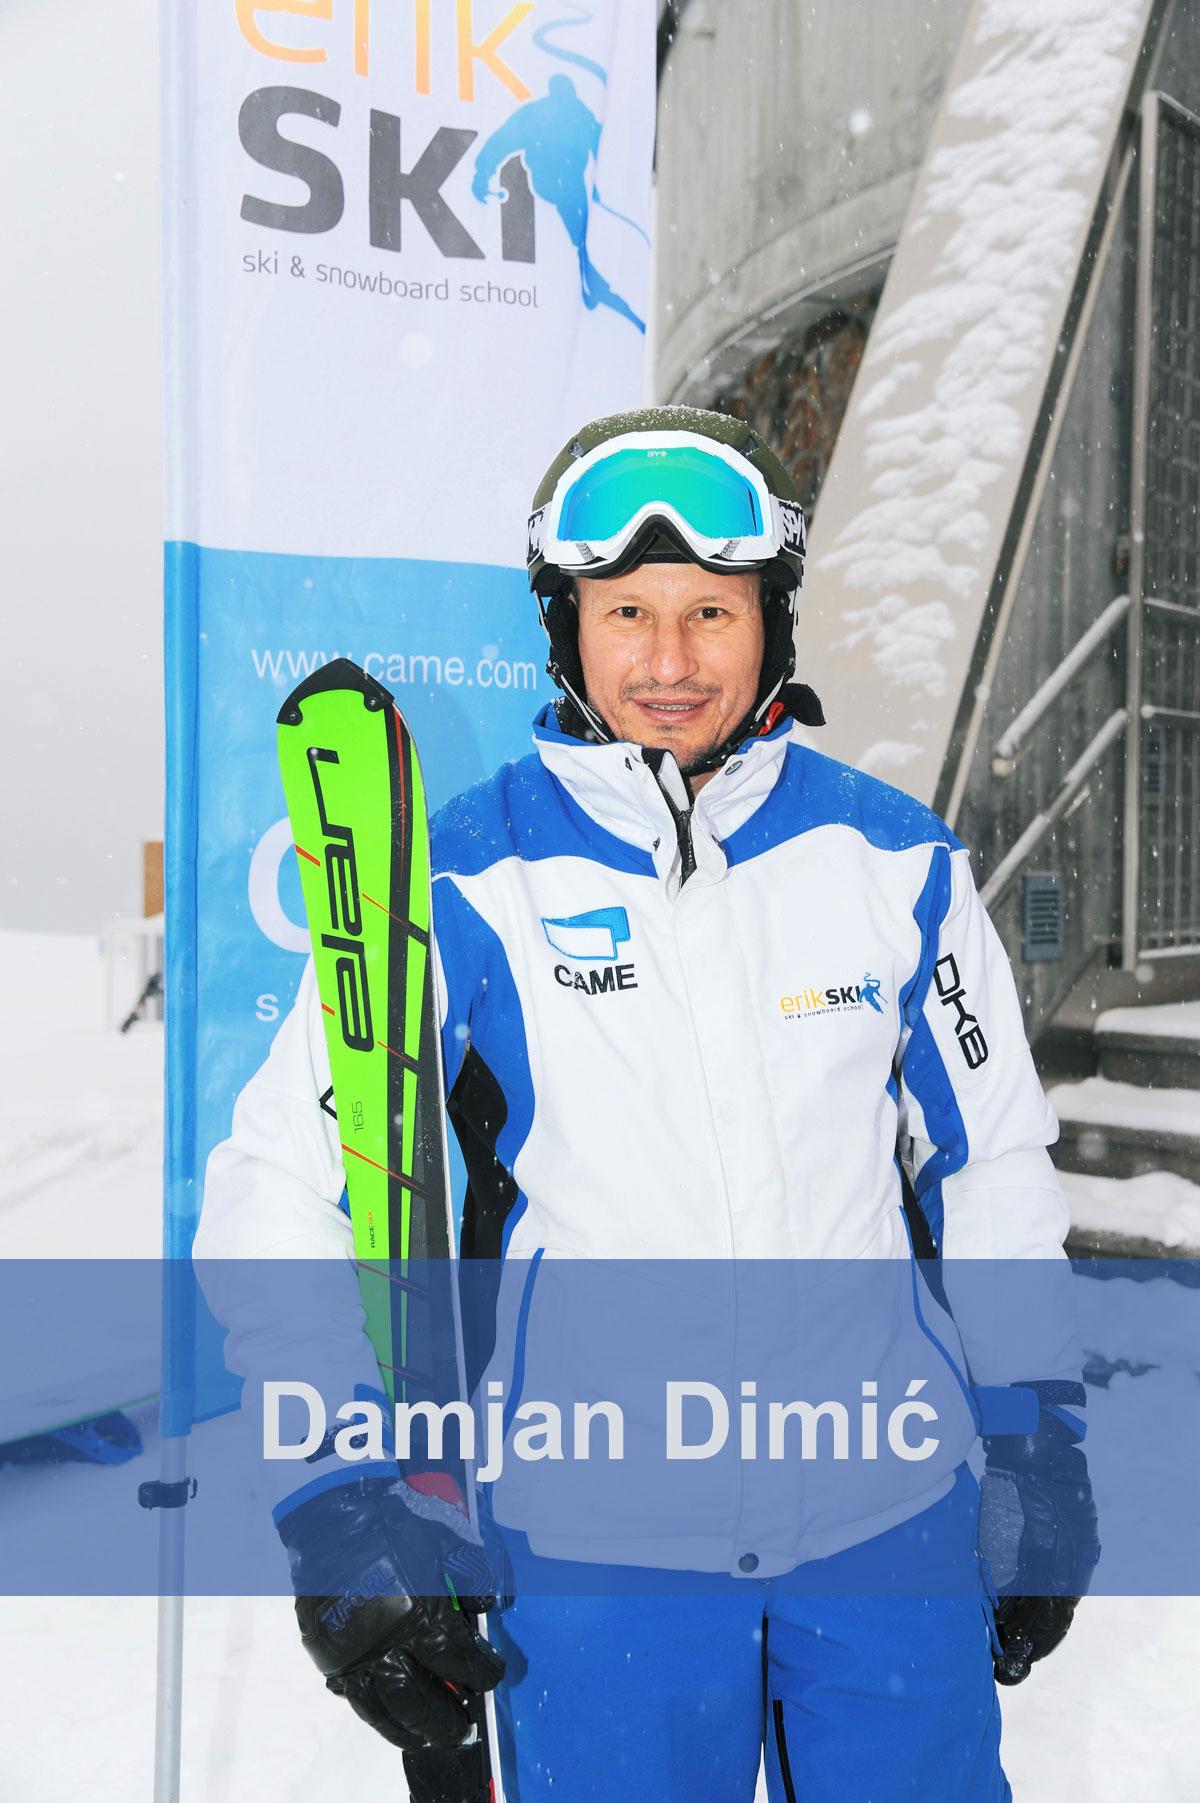 Damjan Dimić